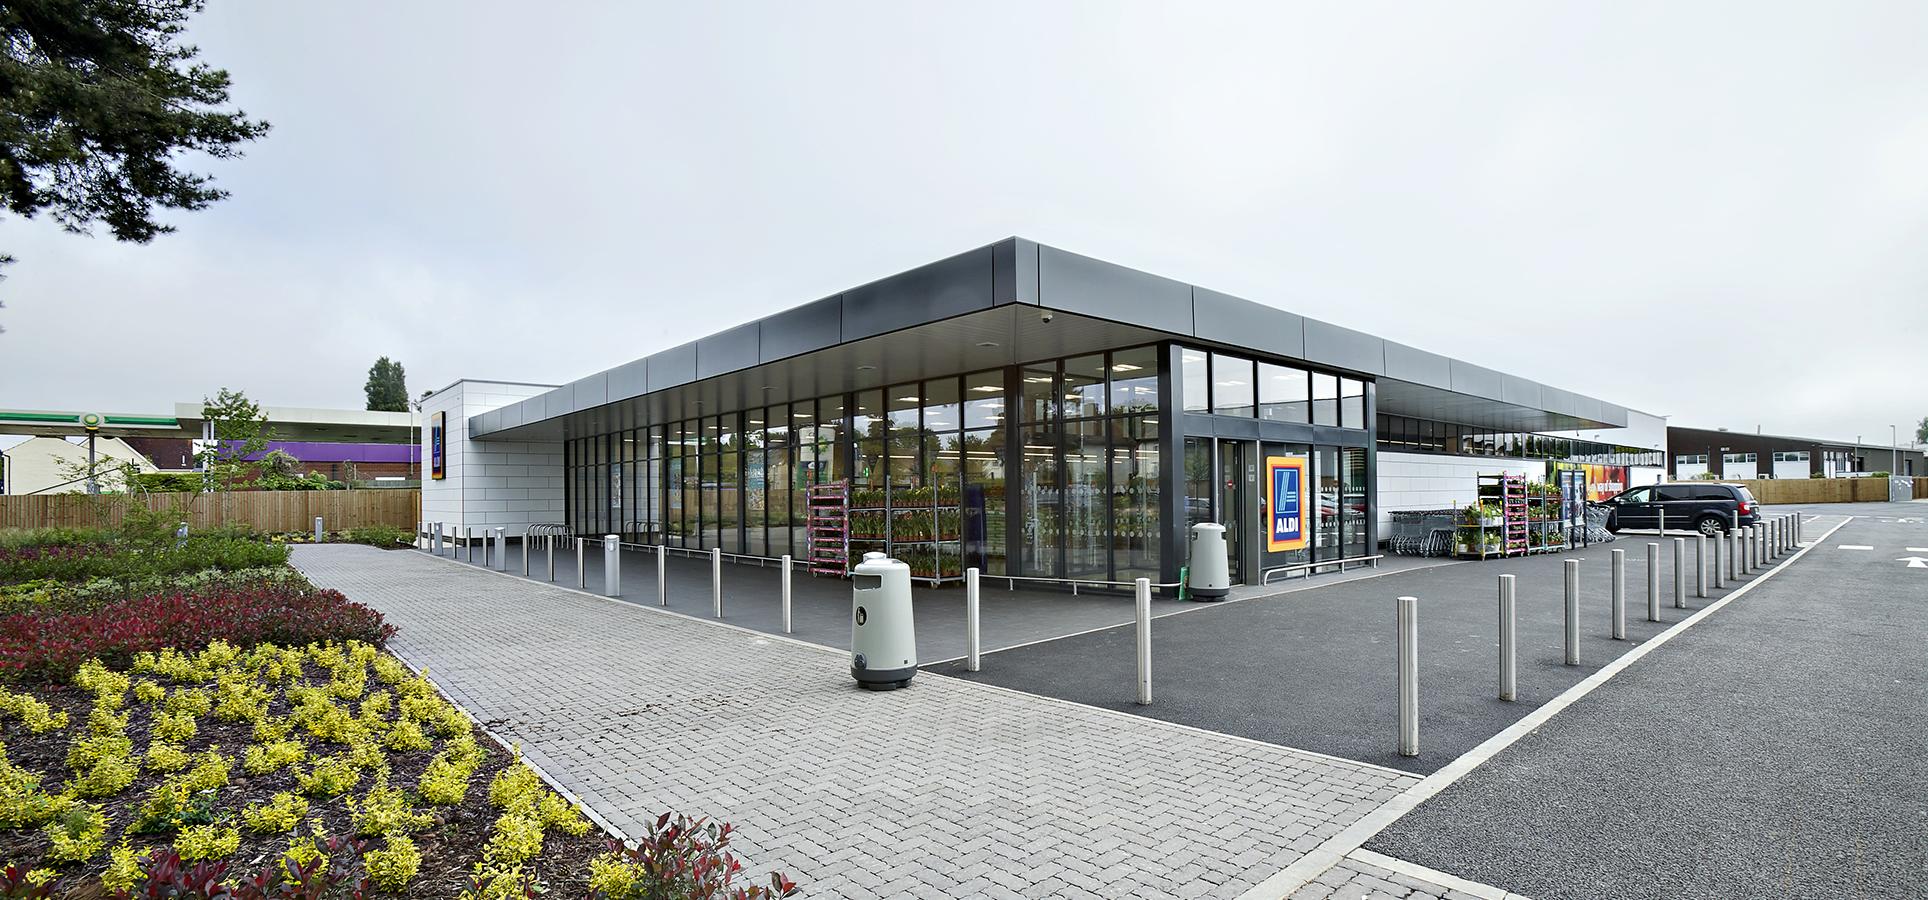 Eaton Socon Retail Park